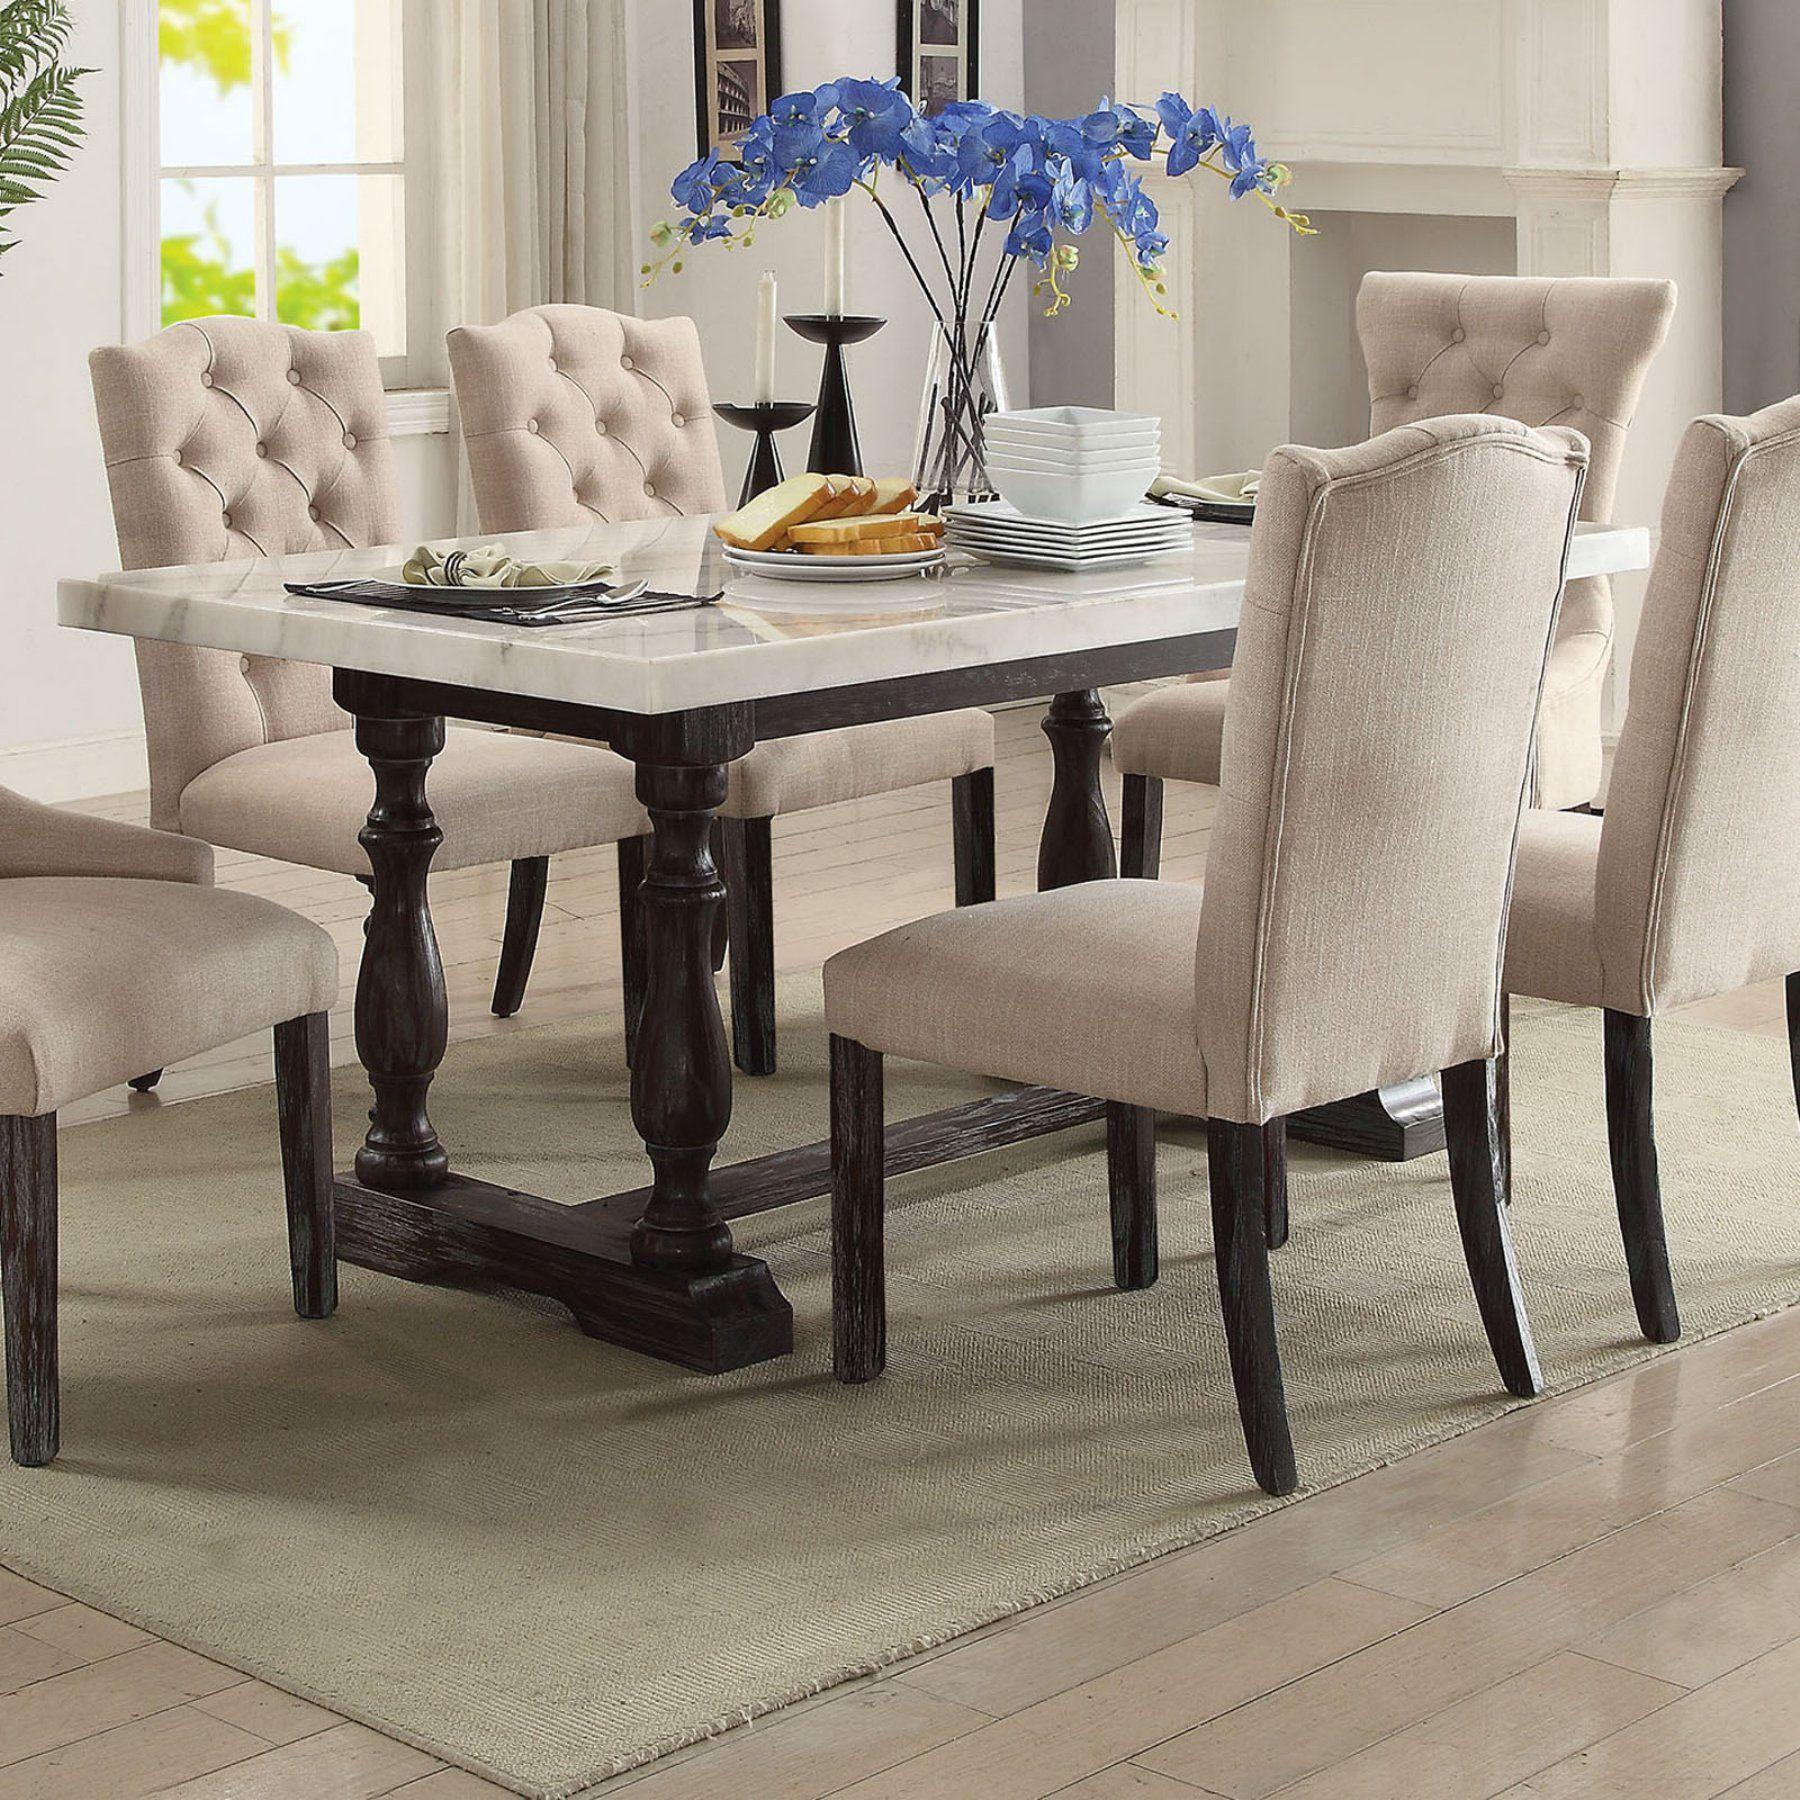 Acme Furniture Gerardo 72 In Rectangular Marble Dining